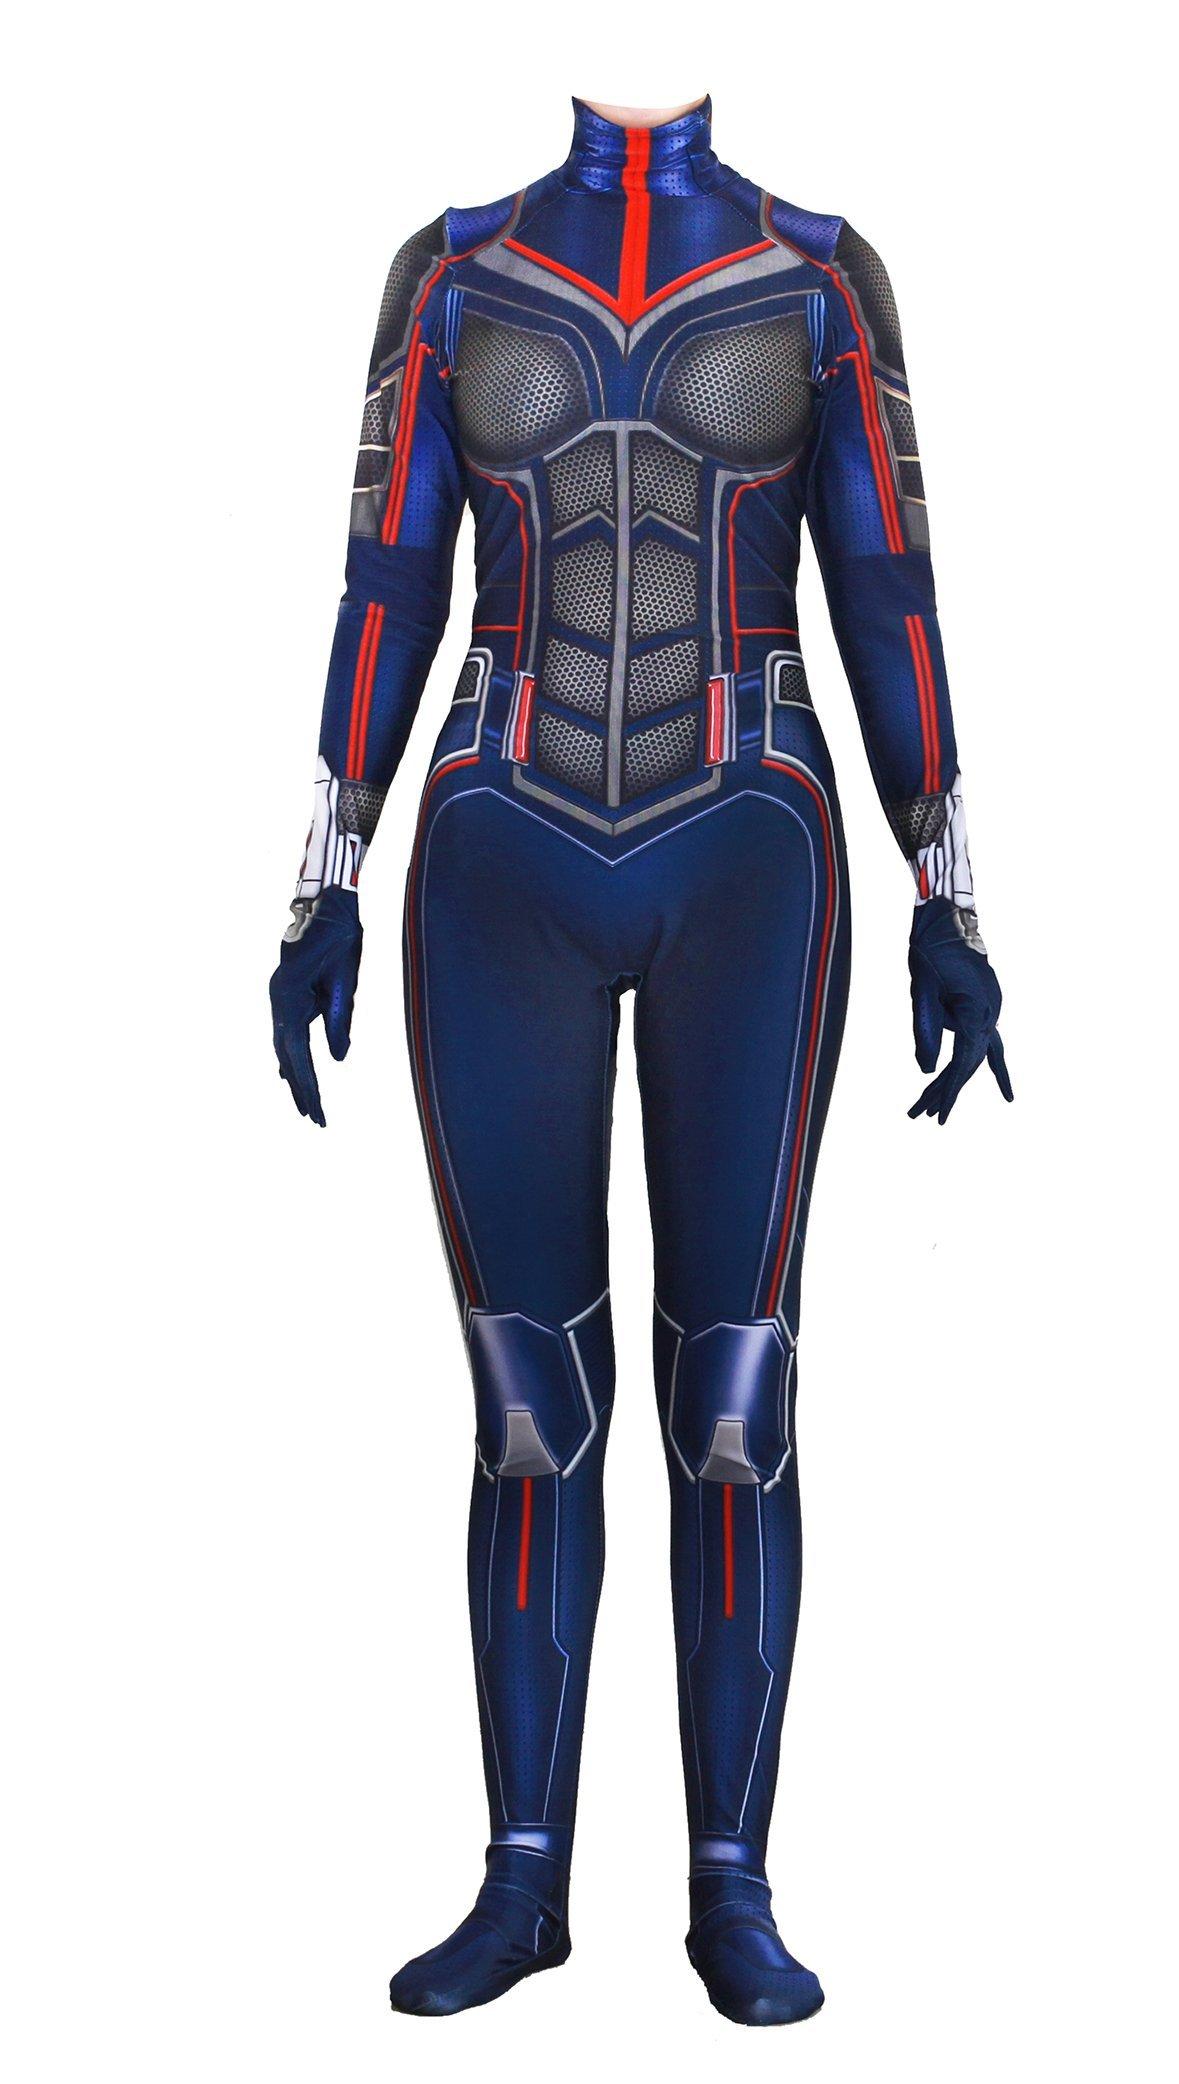 - 71G0SIVHeiL - Riekinc Spandex Bodysuit Womens Zentai Suits Cosplay Costume Audlt/Kids